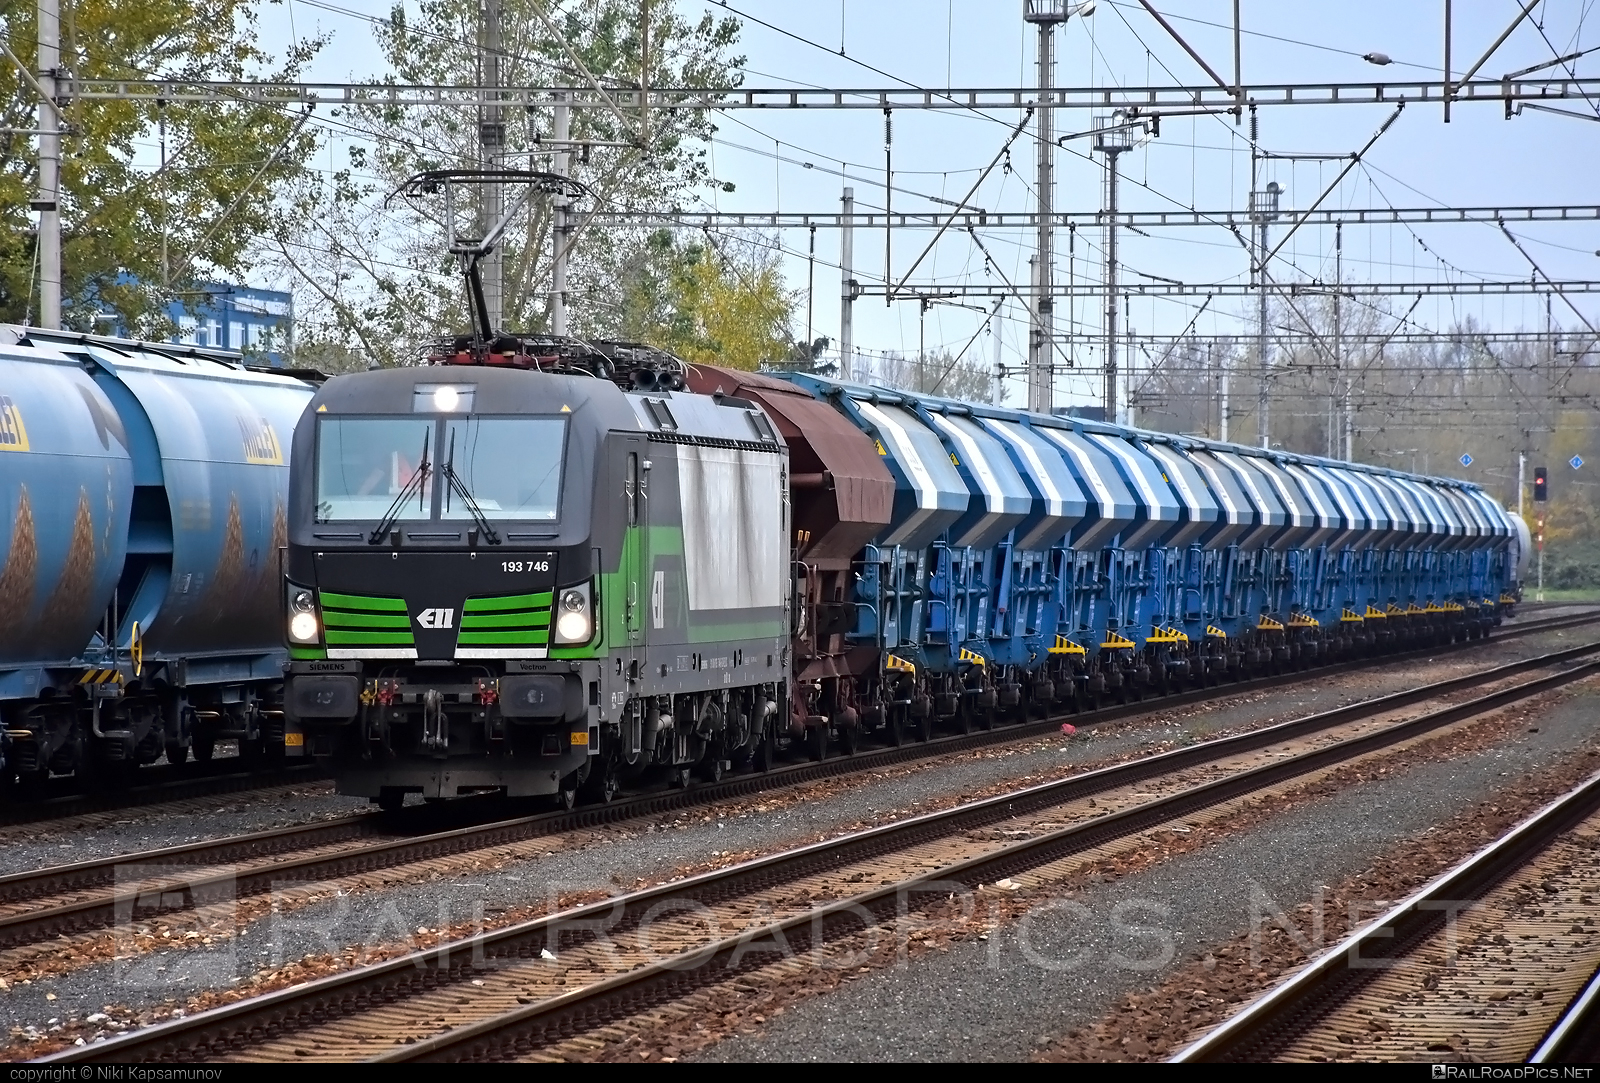 Siemens Vectron MS - 193 746 operated by Salzburger Eisenbahn Transportlogistik GmbH #SalzburgerEisenbahnTransportlogistik #SalzburgerEisenbahnTransportlogistikGmbH #duslo #ell #ellgermany #eloc #europeanlocomotiveleasing #hopperwagon #setg #siemens #siemensvectron #siemensvectronms #vectron #vectronms